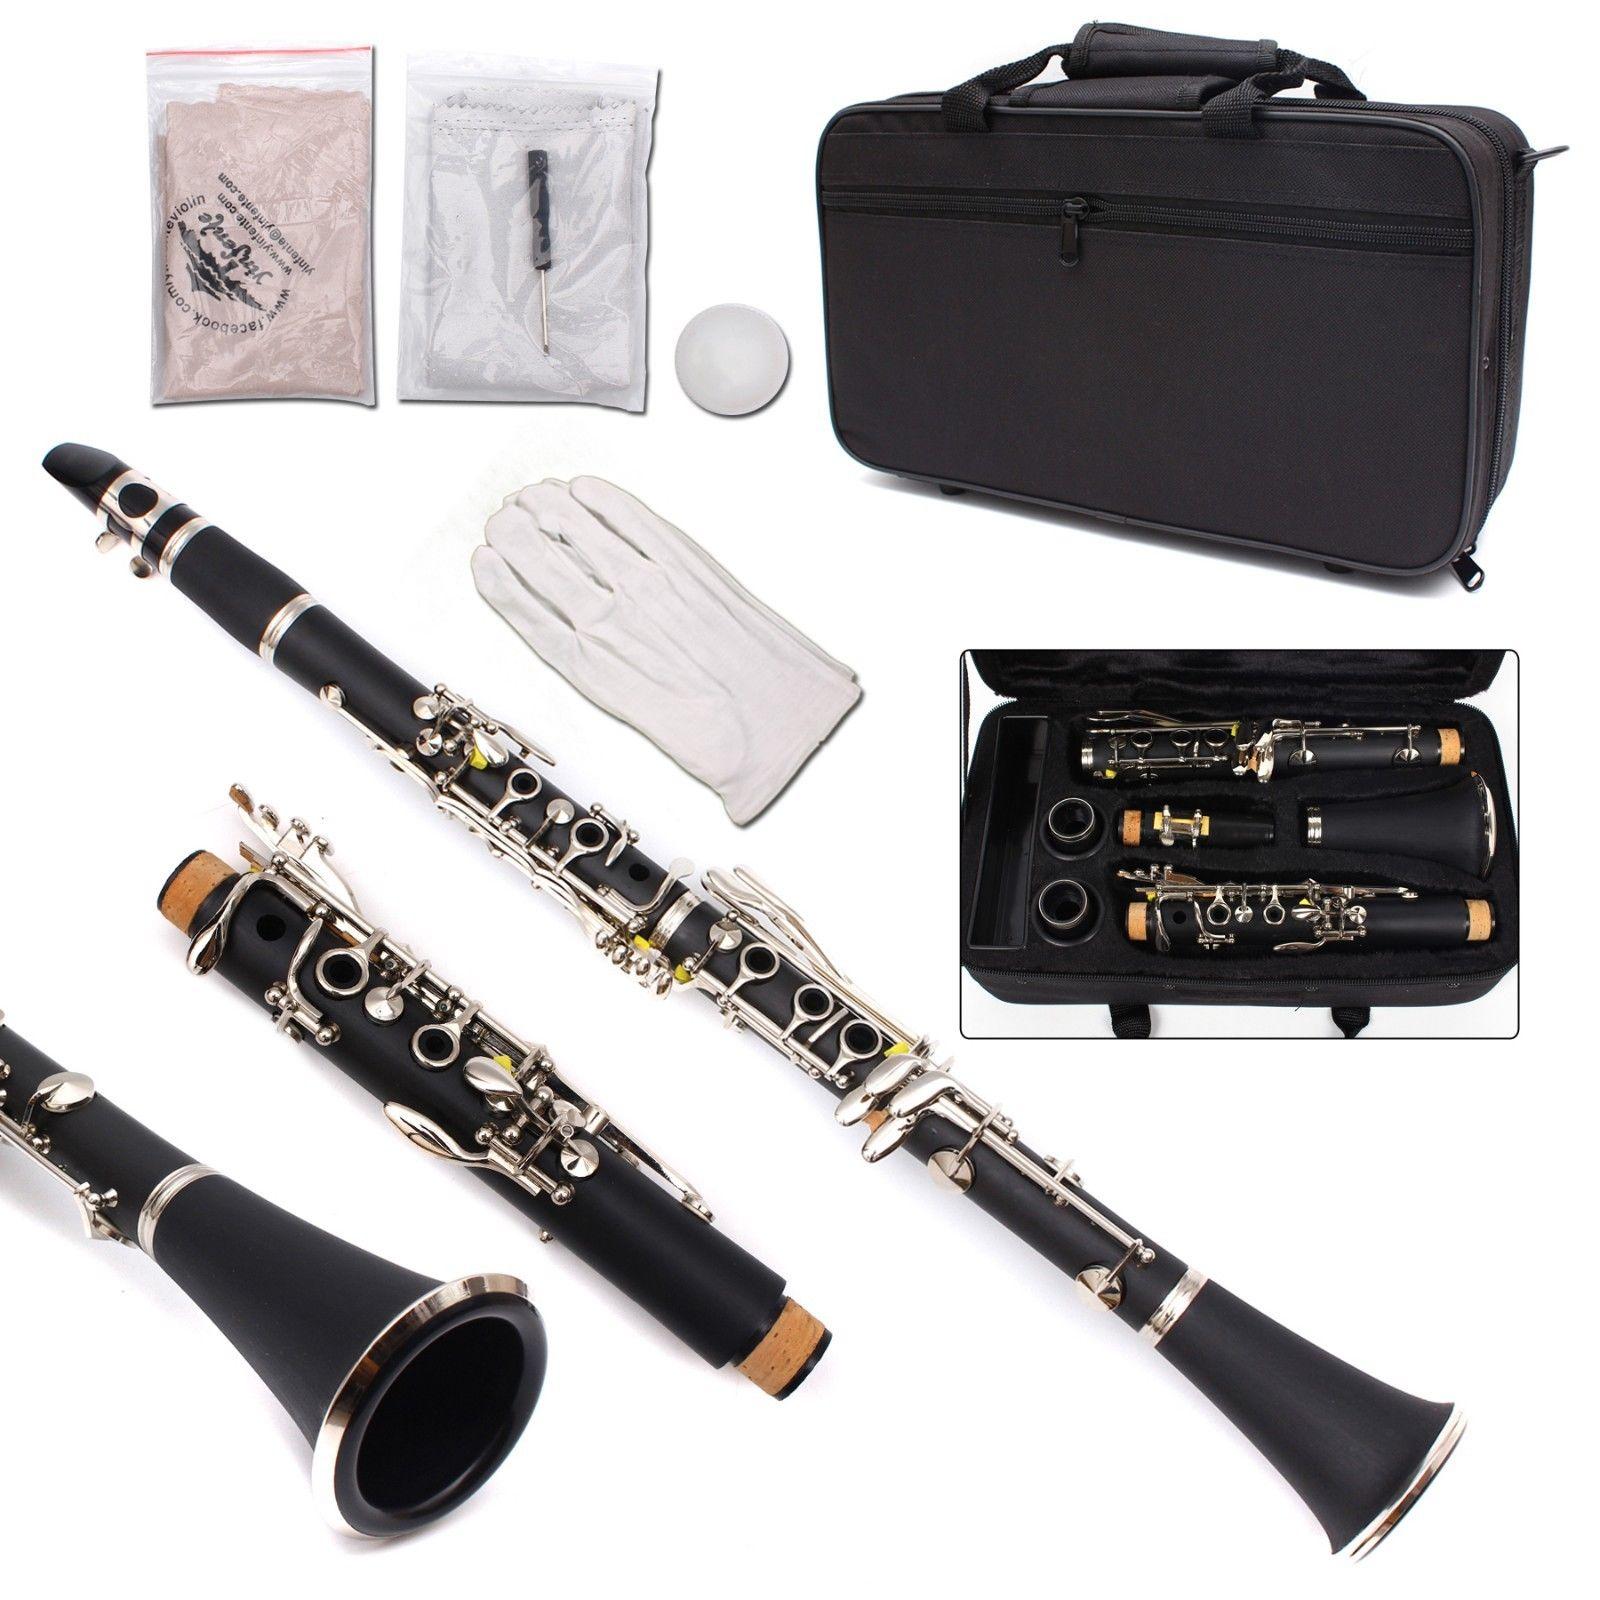 New Professional Clarinet Ebonite Wood Nickel Plated Key Bb Key 17 key Case #7New Professional Clarinet Ebonite Wood Nickel Plated Key Bb Key 17 key Case #7